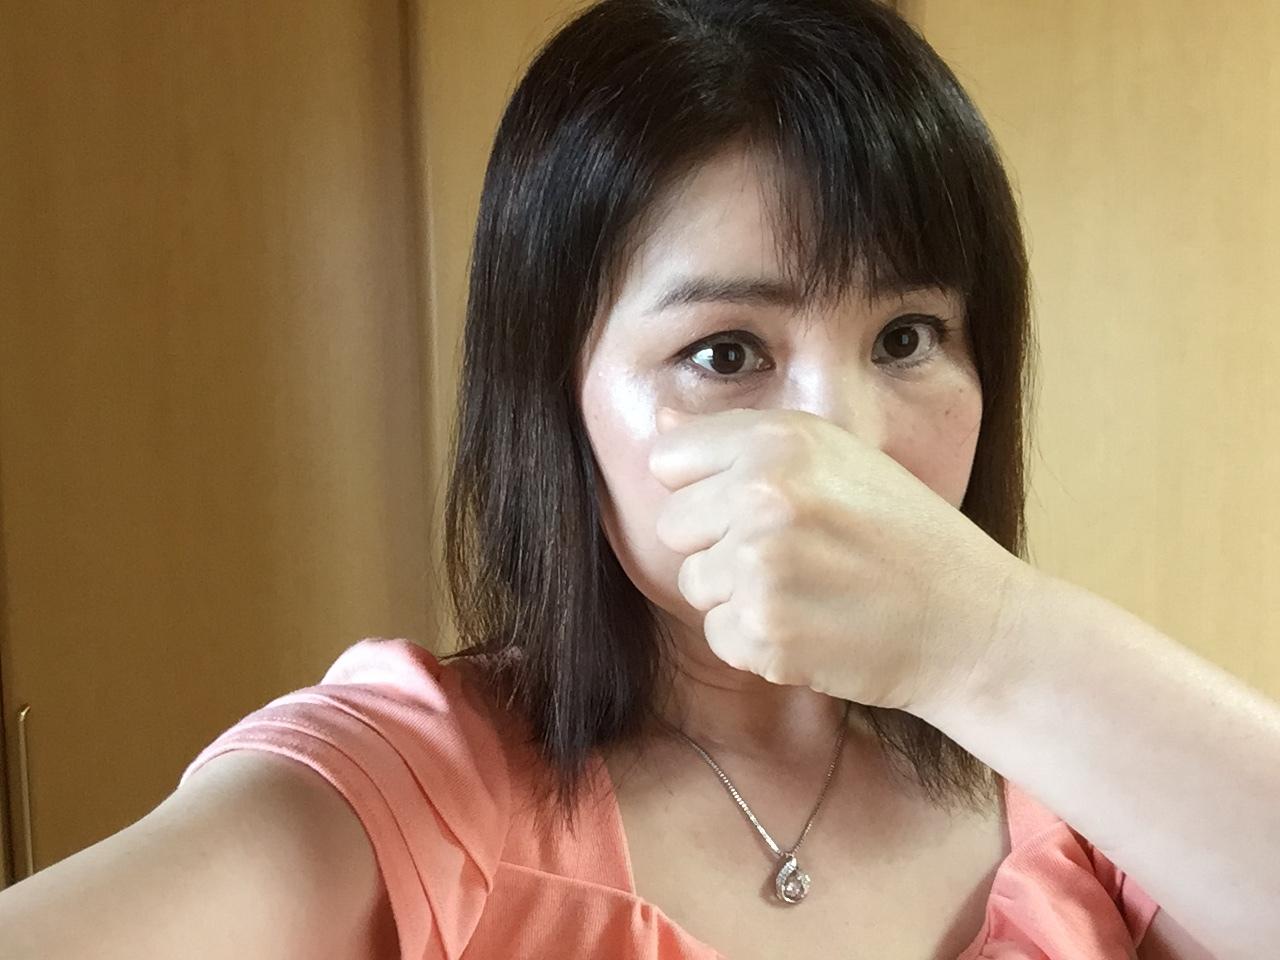 arisa03580 - Japanese webcam girl